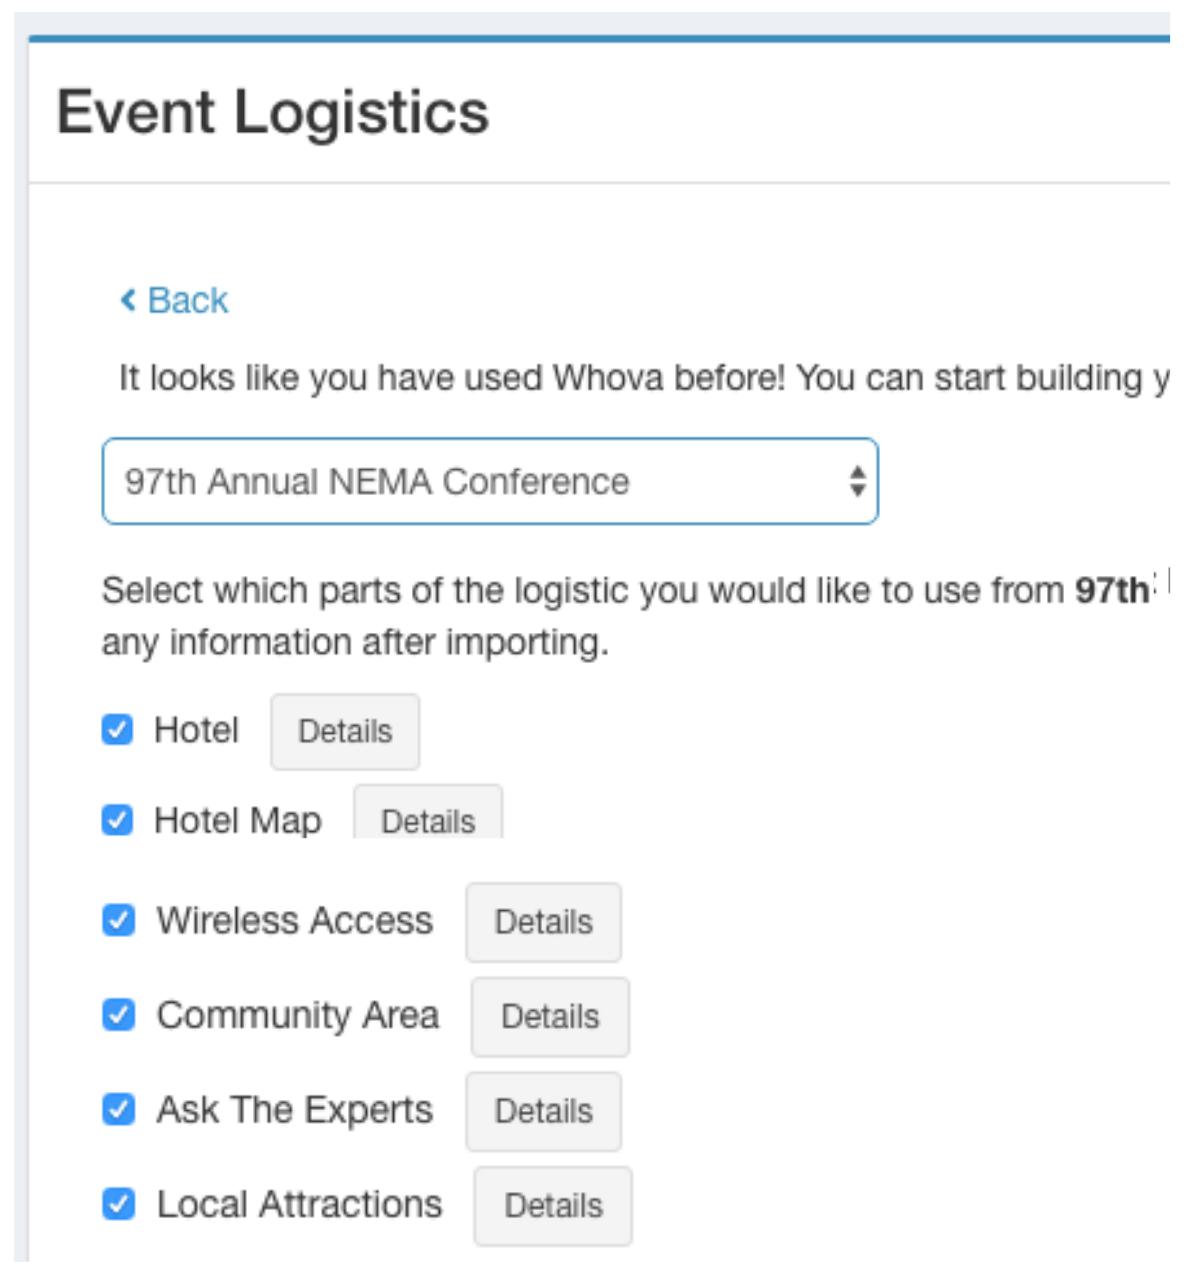 Whova's Event Logistics window with a list of past event logistics